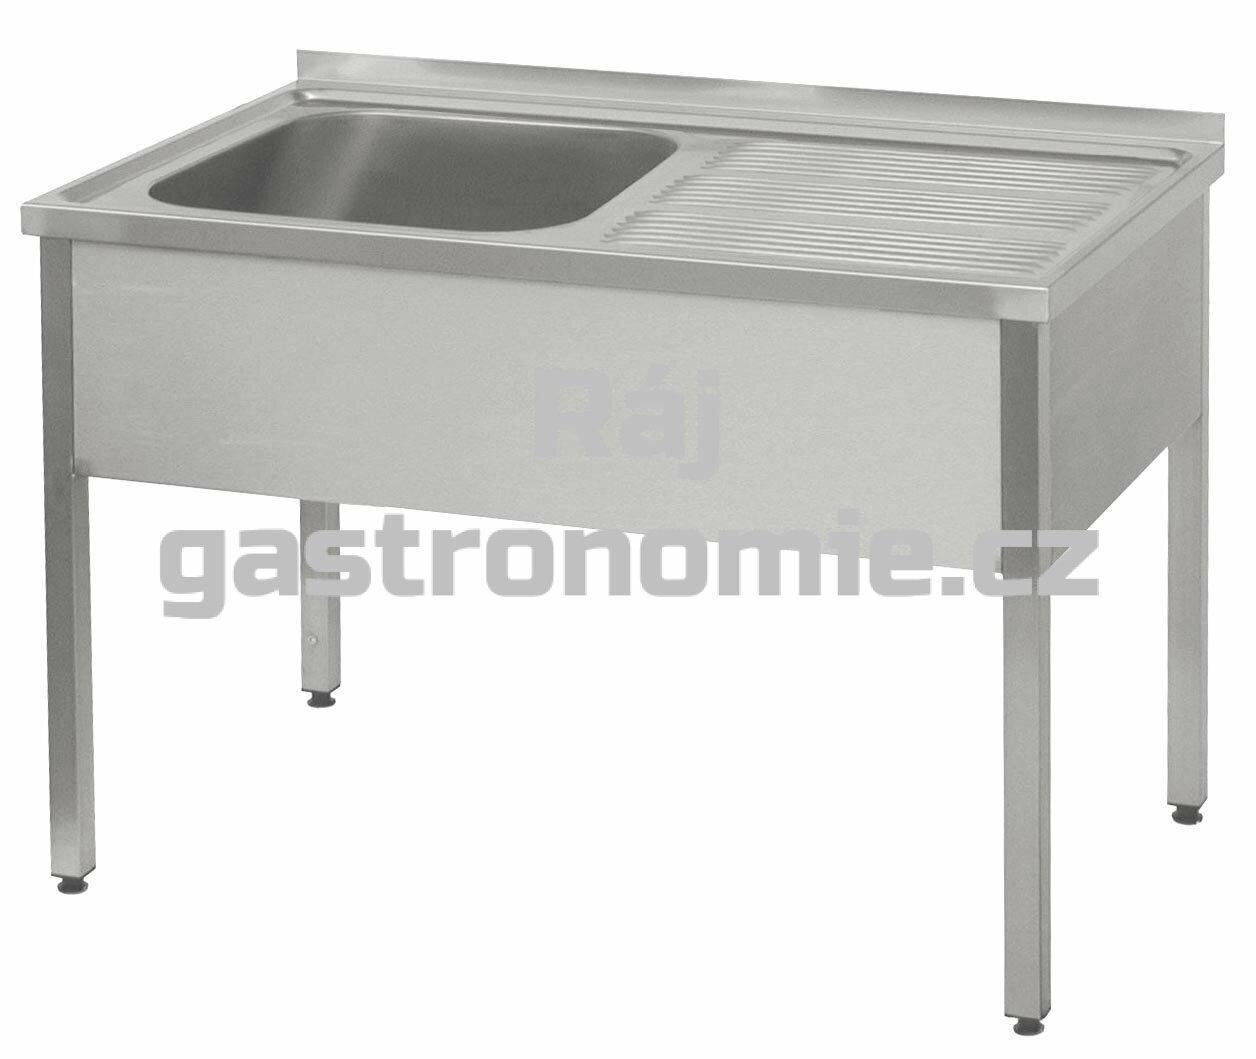 Dřez - 120x60, nádoba 50x50x30 cm